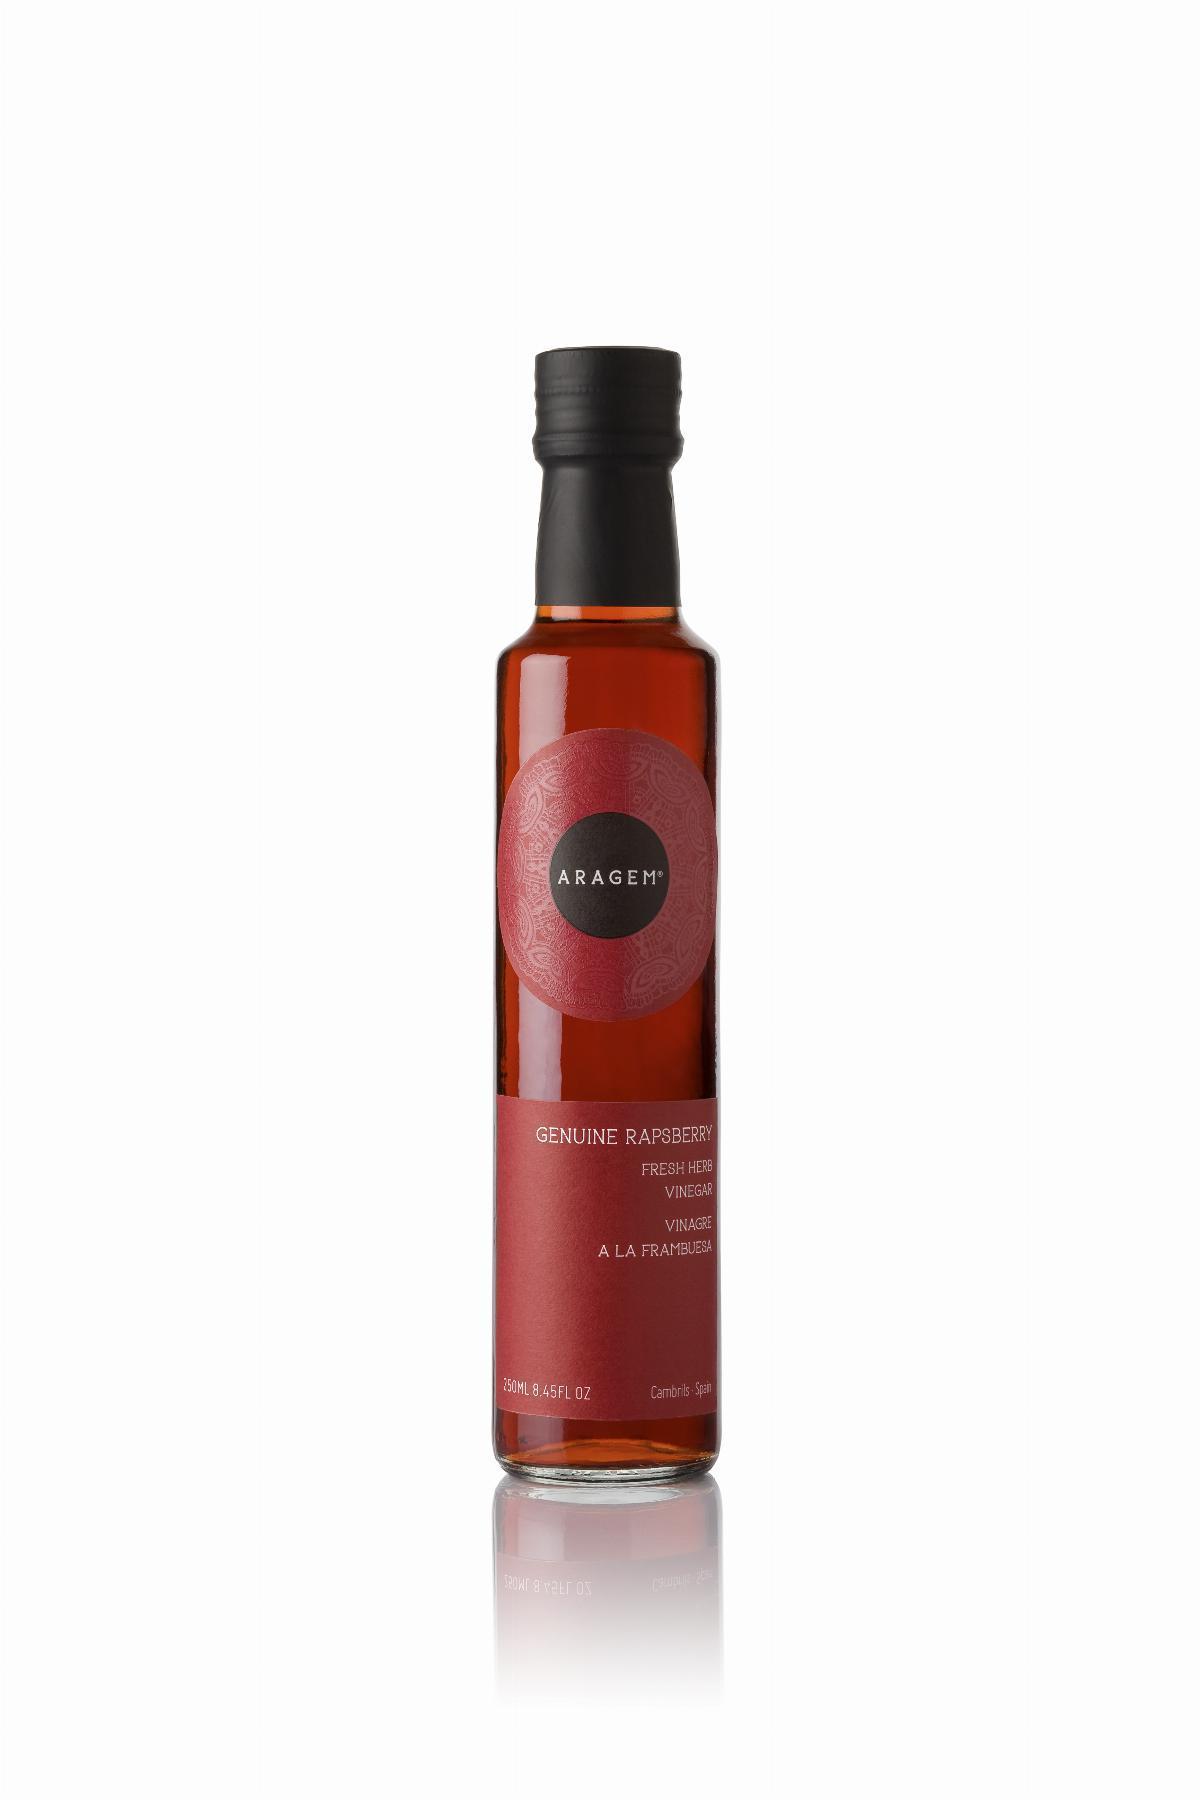 Vinagre de Gerds Aragem, ampolla Dòrica transp.  250ml. ES